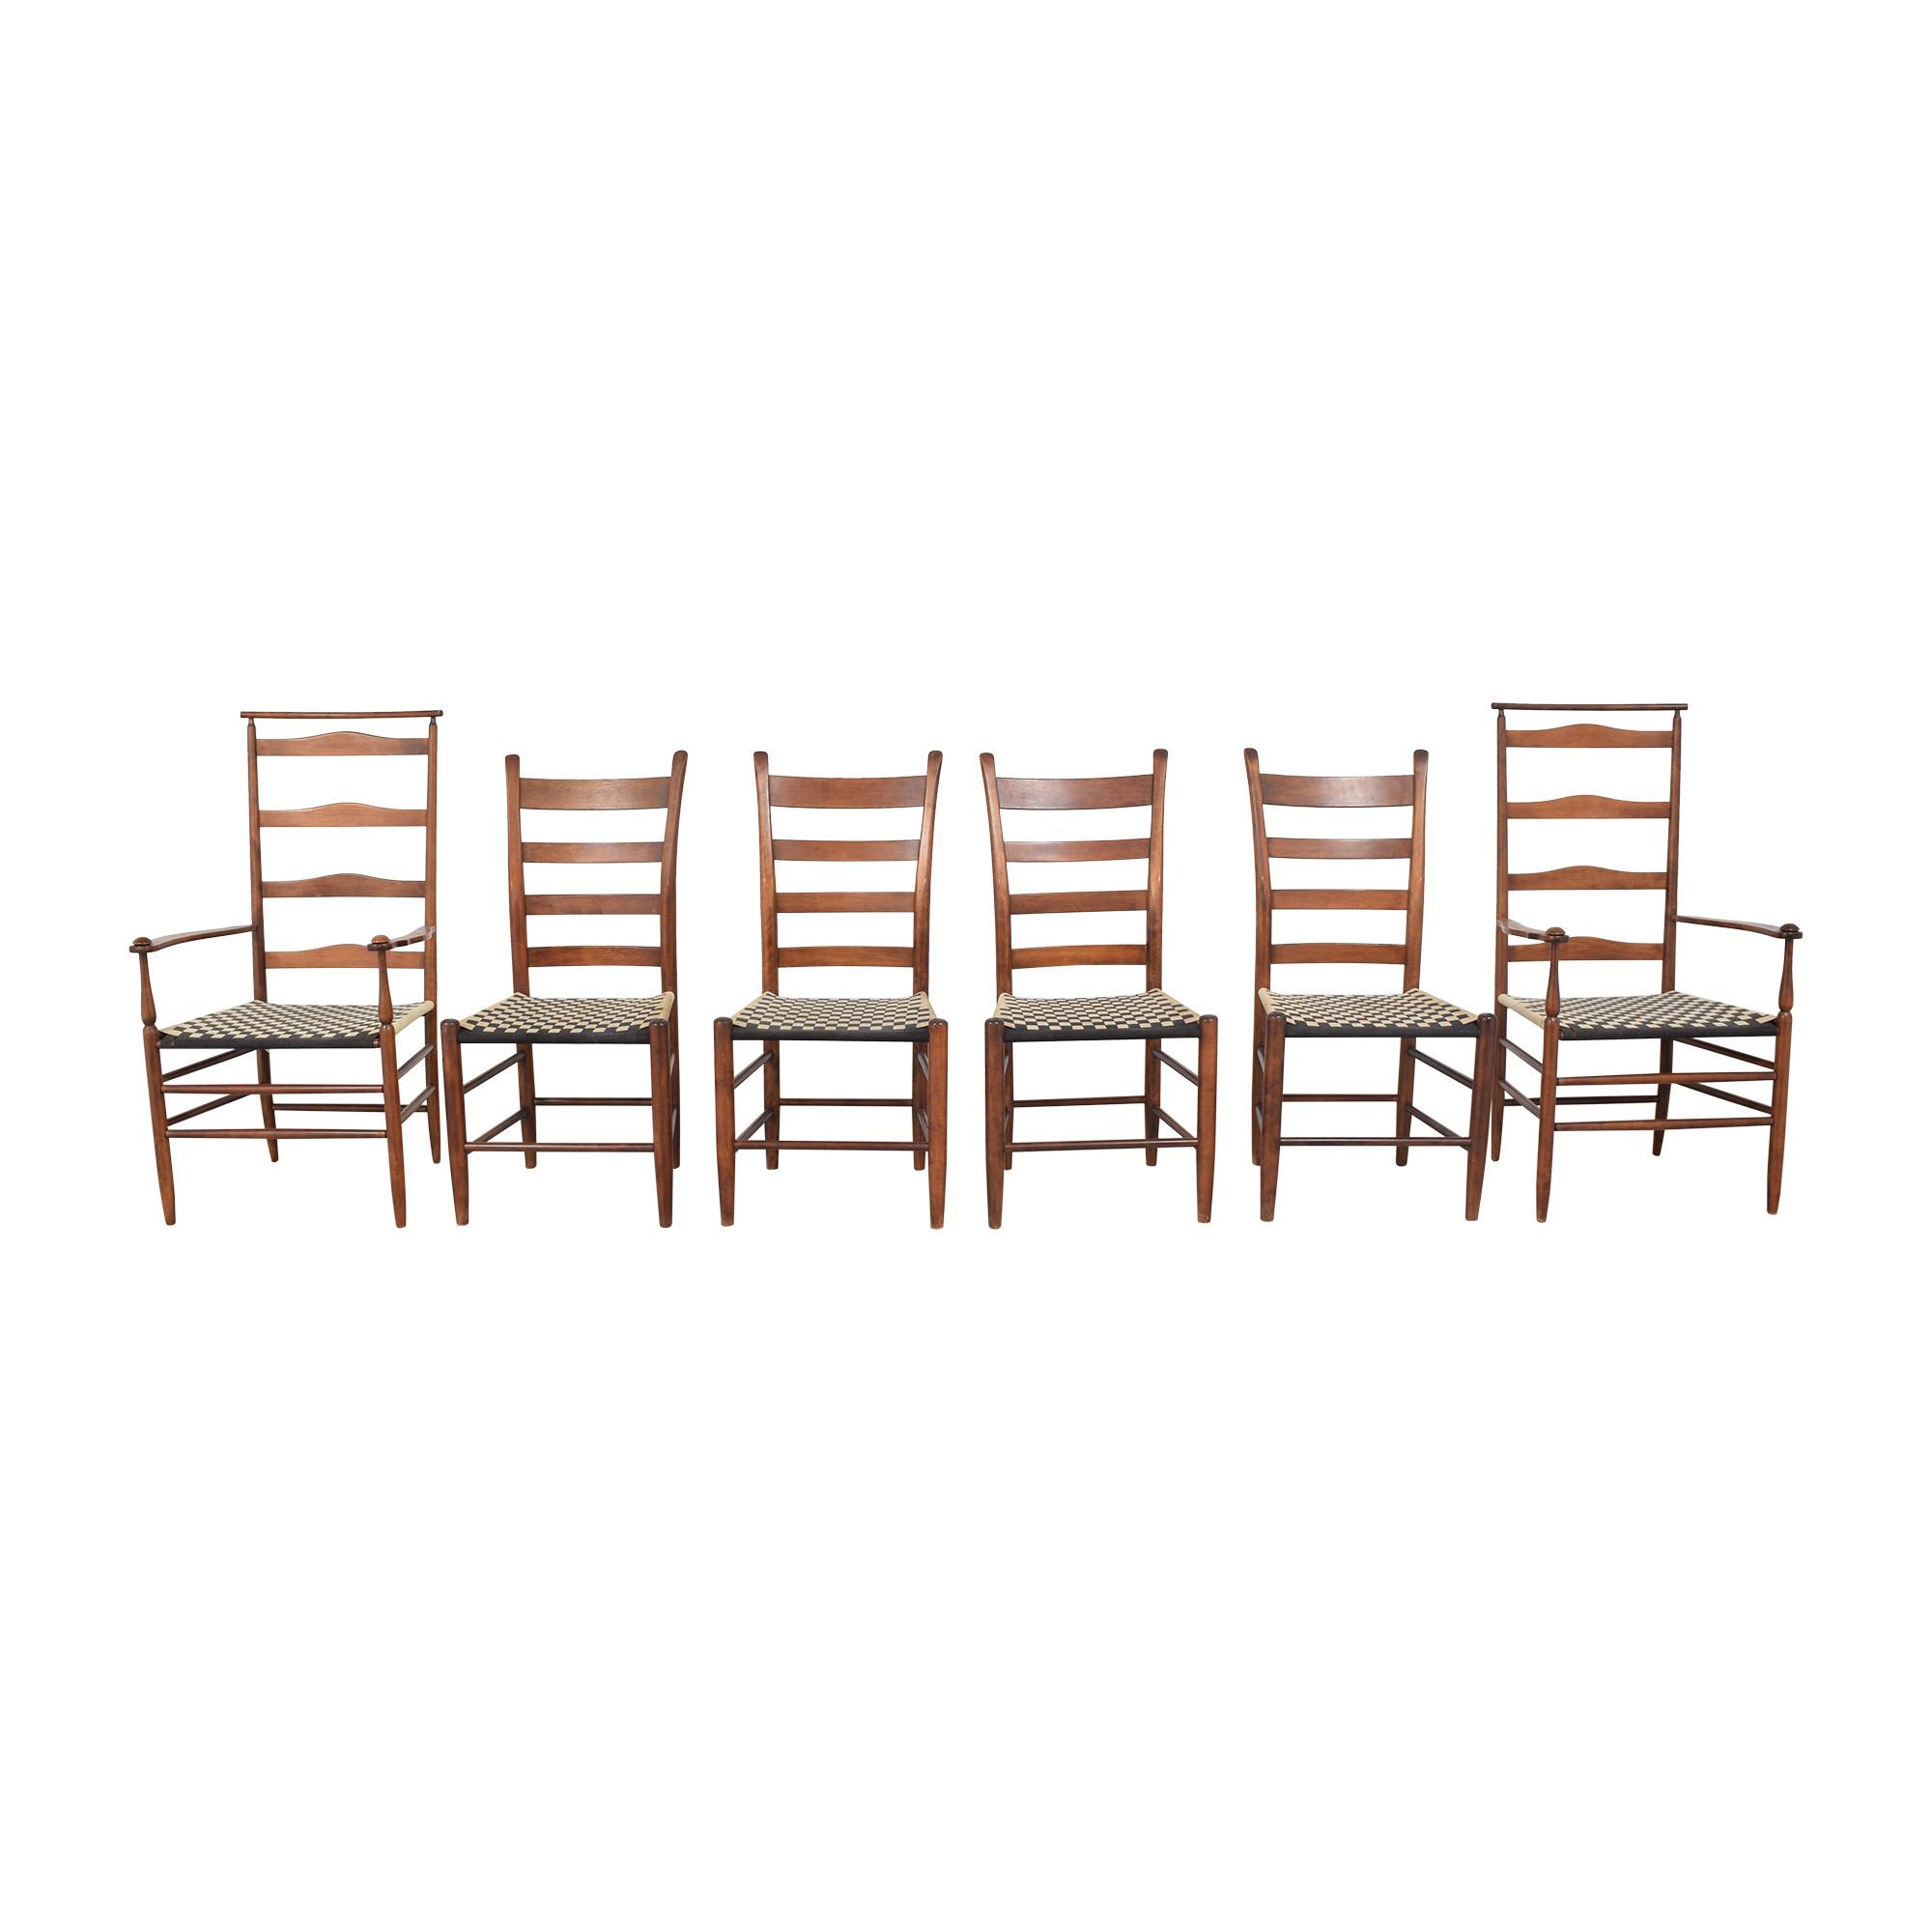 shop Nichols & Stone Ladder Back Dining Chairs Nichols & Stone